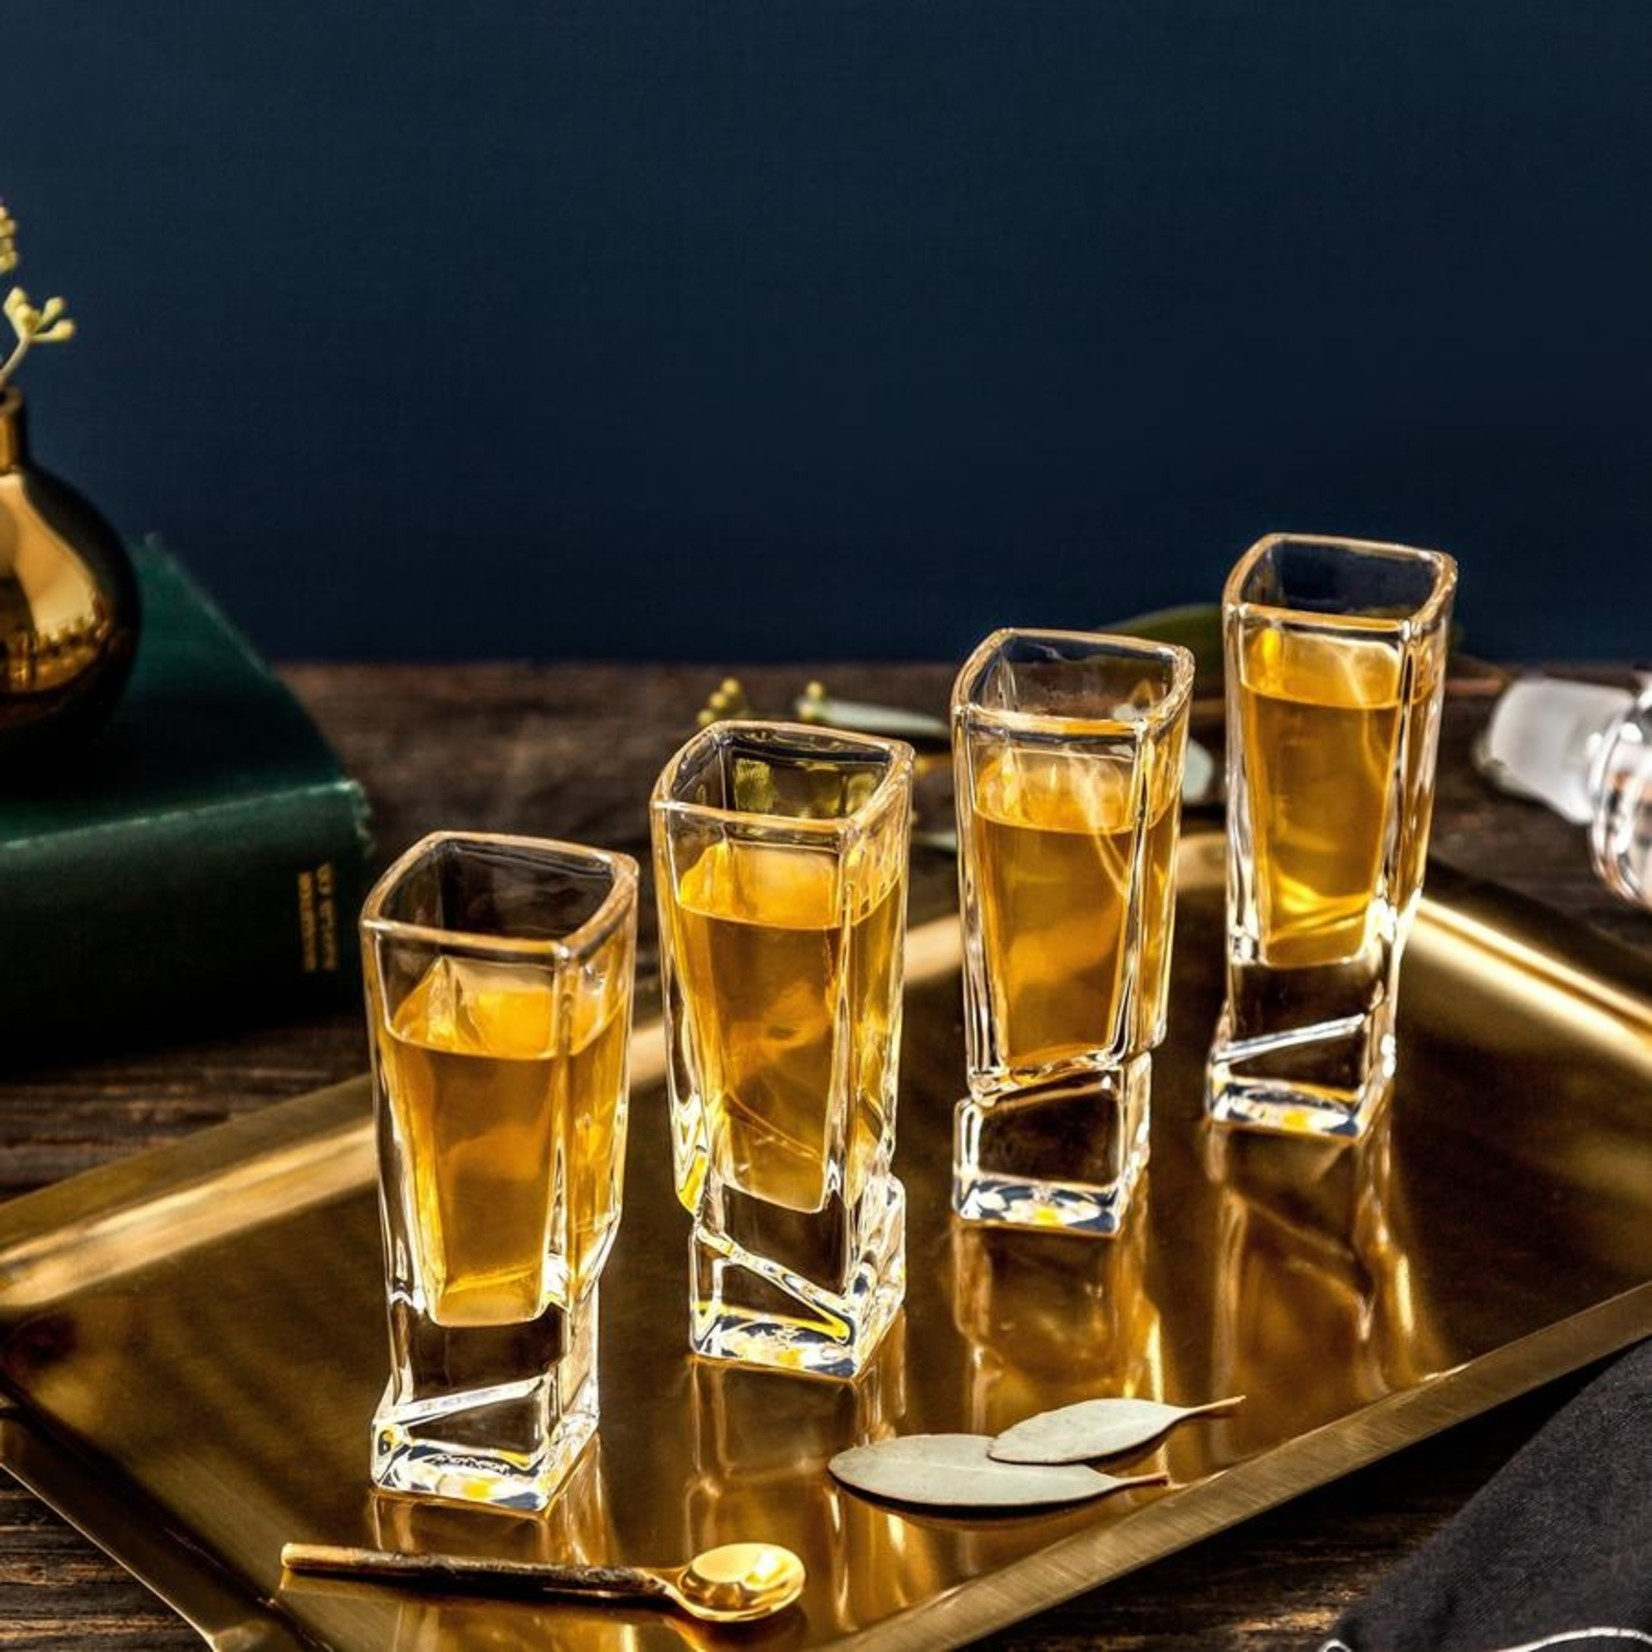 Joy Jolt Carre Shot Glasses - Set of 4